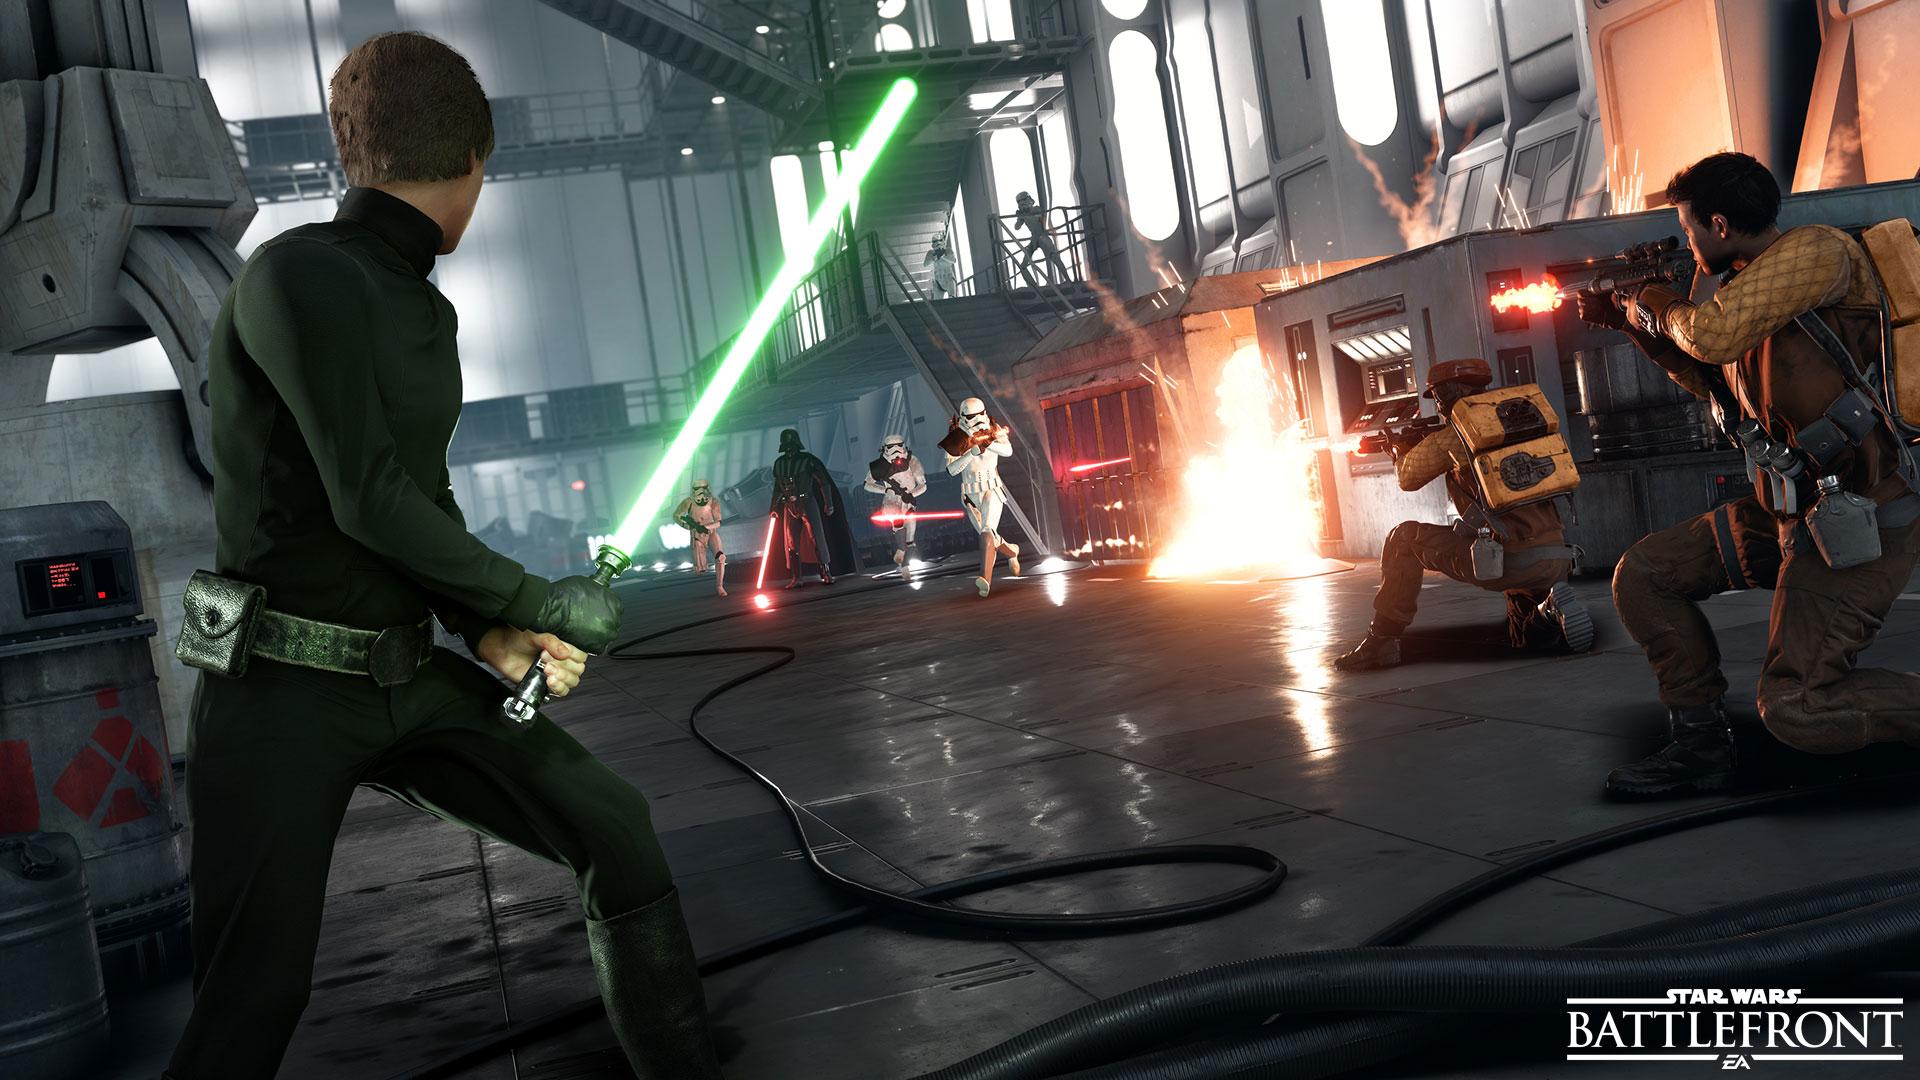 image - rendition1.img | star wars battlefront wiki | fandom